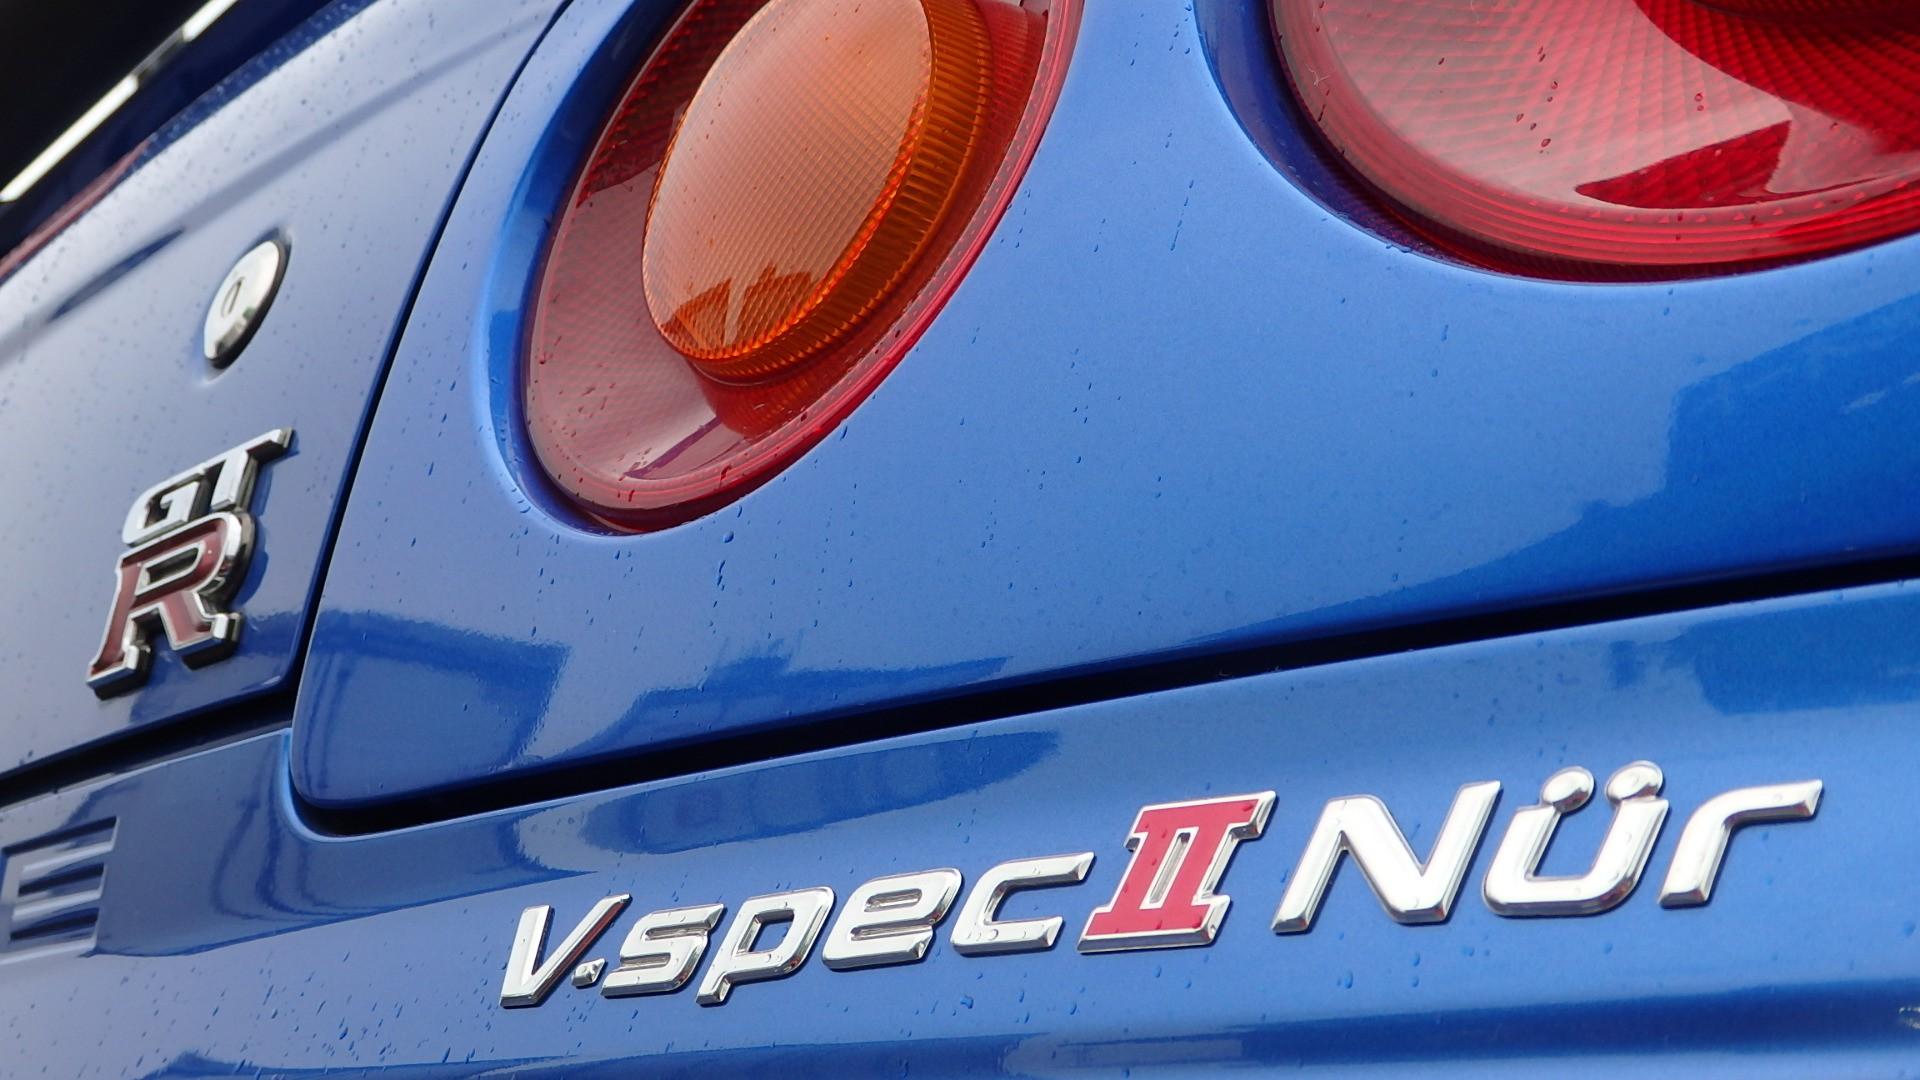 Car Auction Usa >> Nissan Skyline GTR R34 V-Spec II NUR for sale in Japan